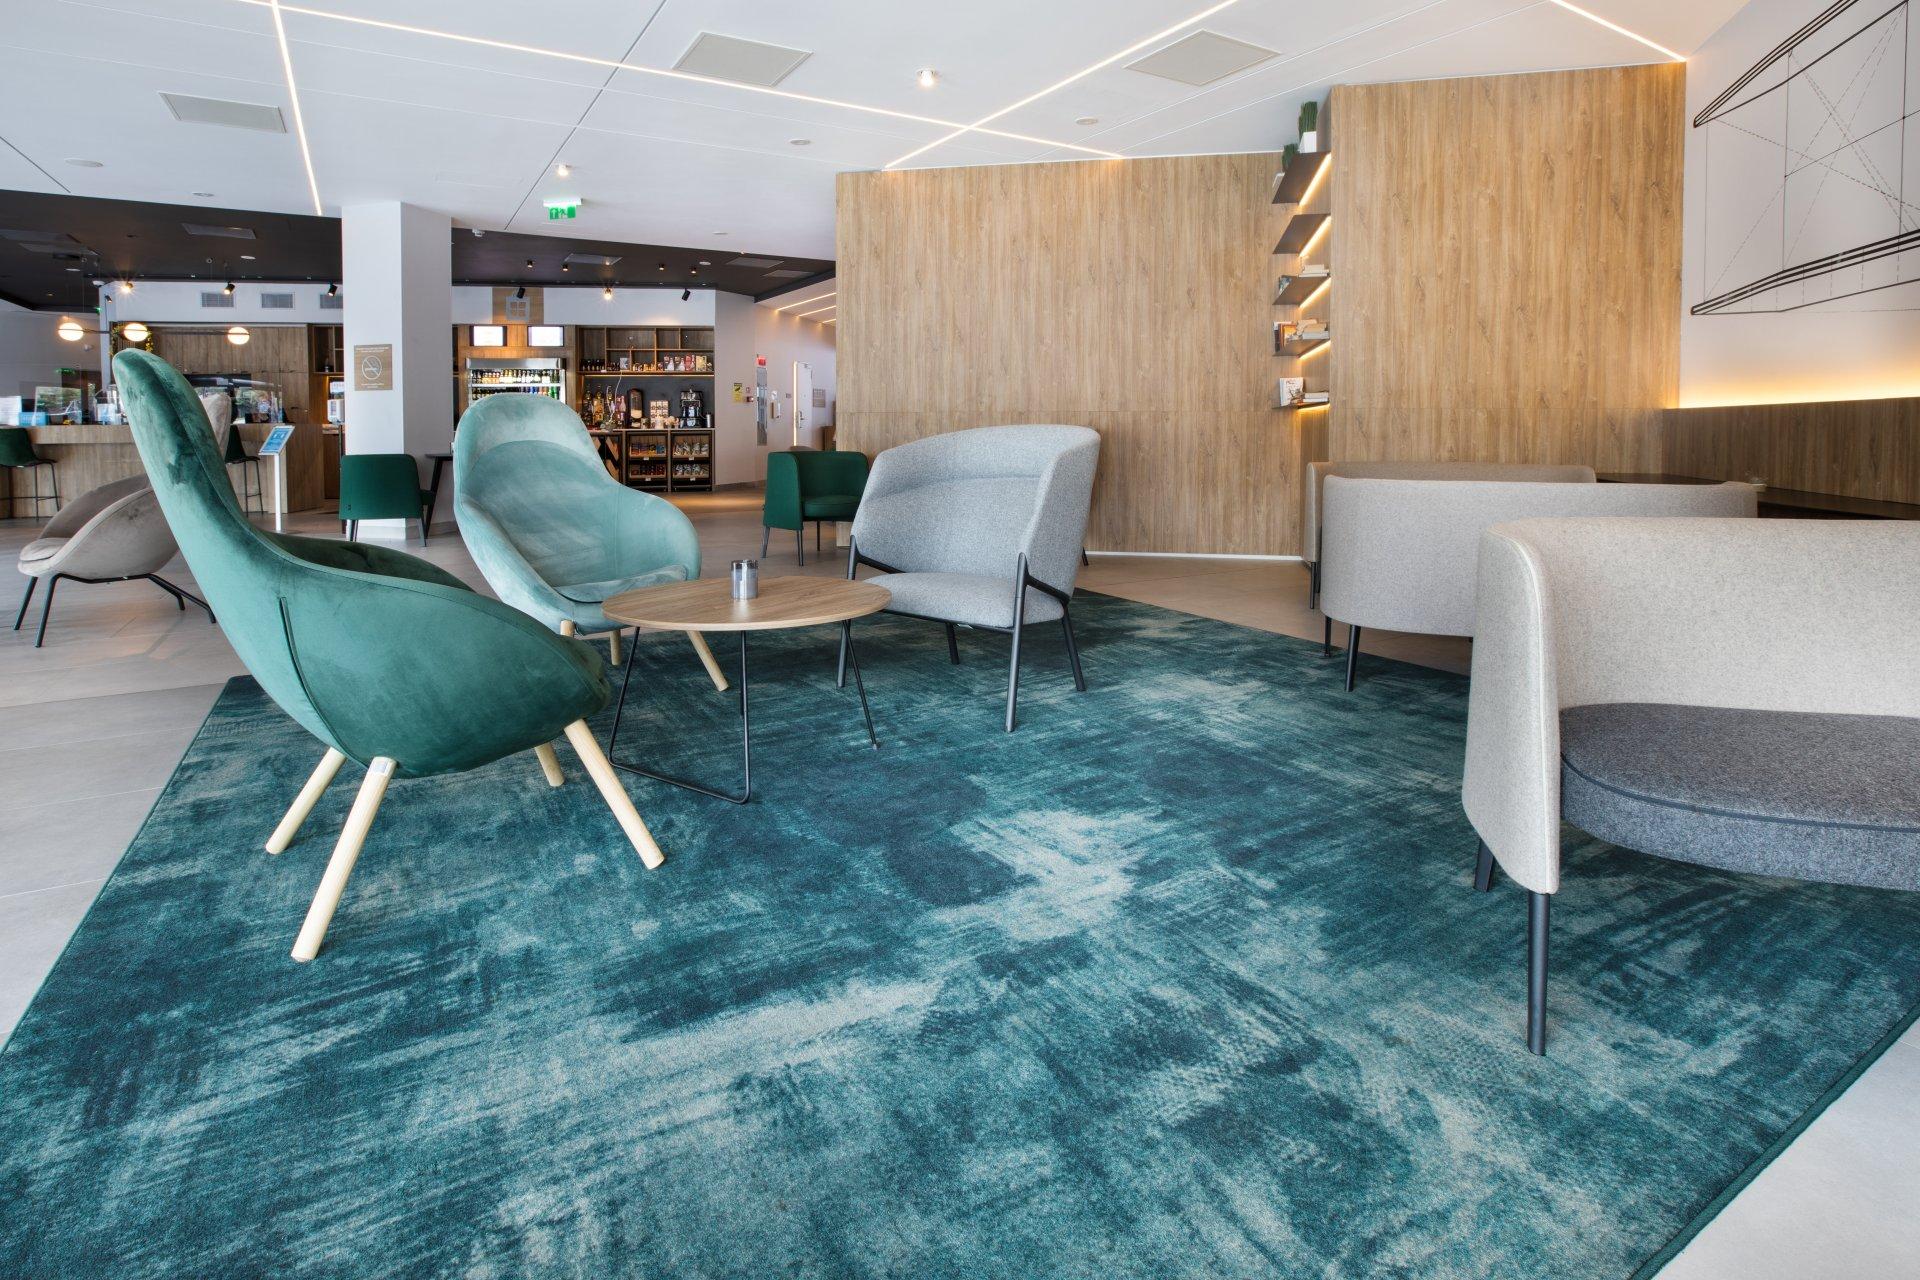 20200625-carpet-and-more-hilton-otopeni-24